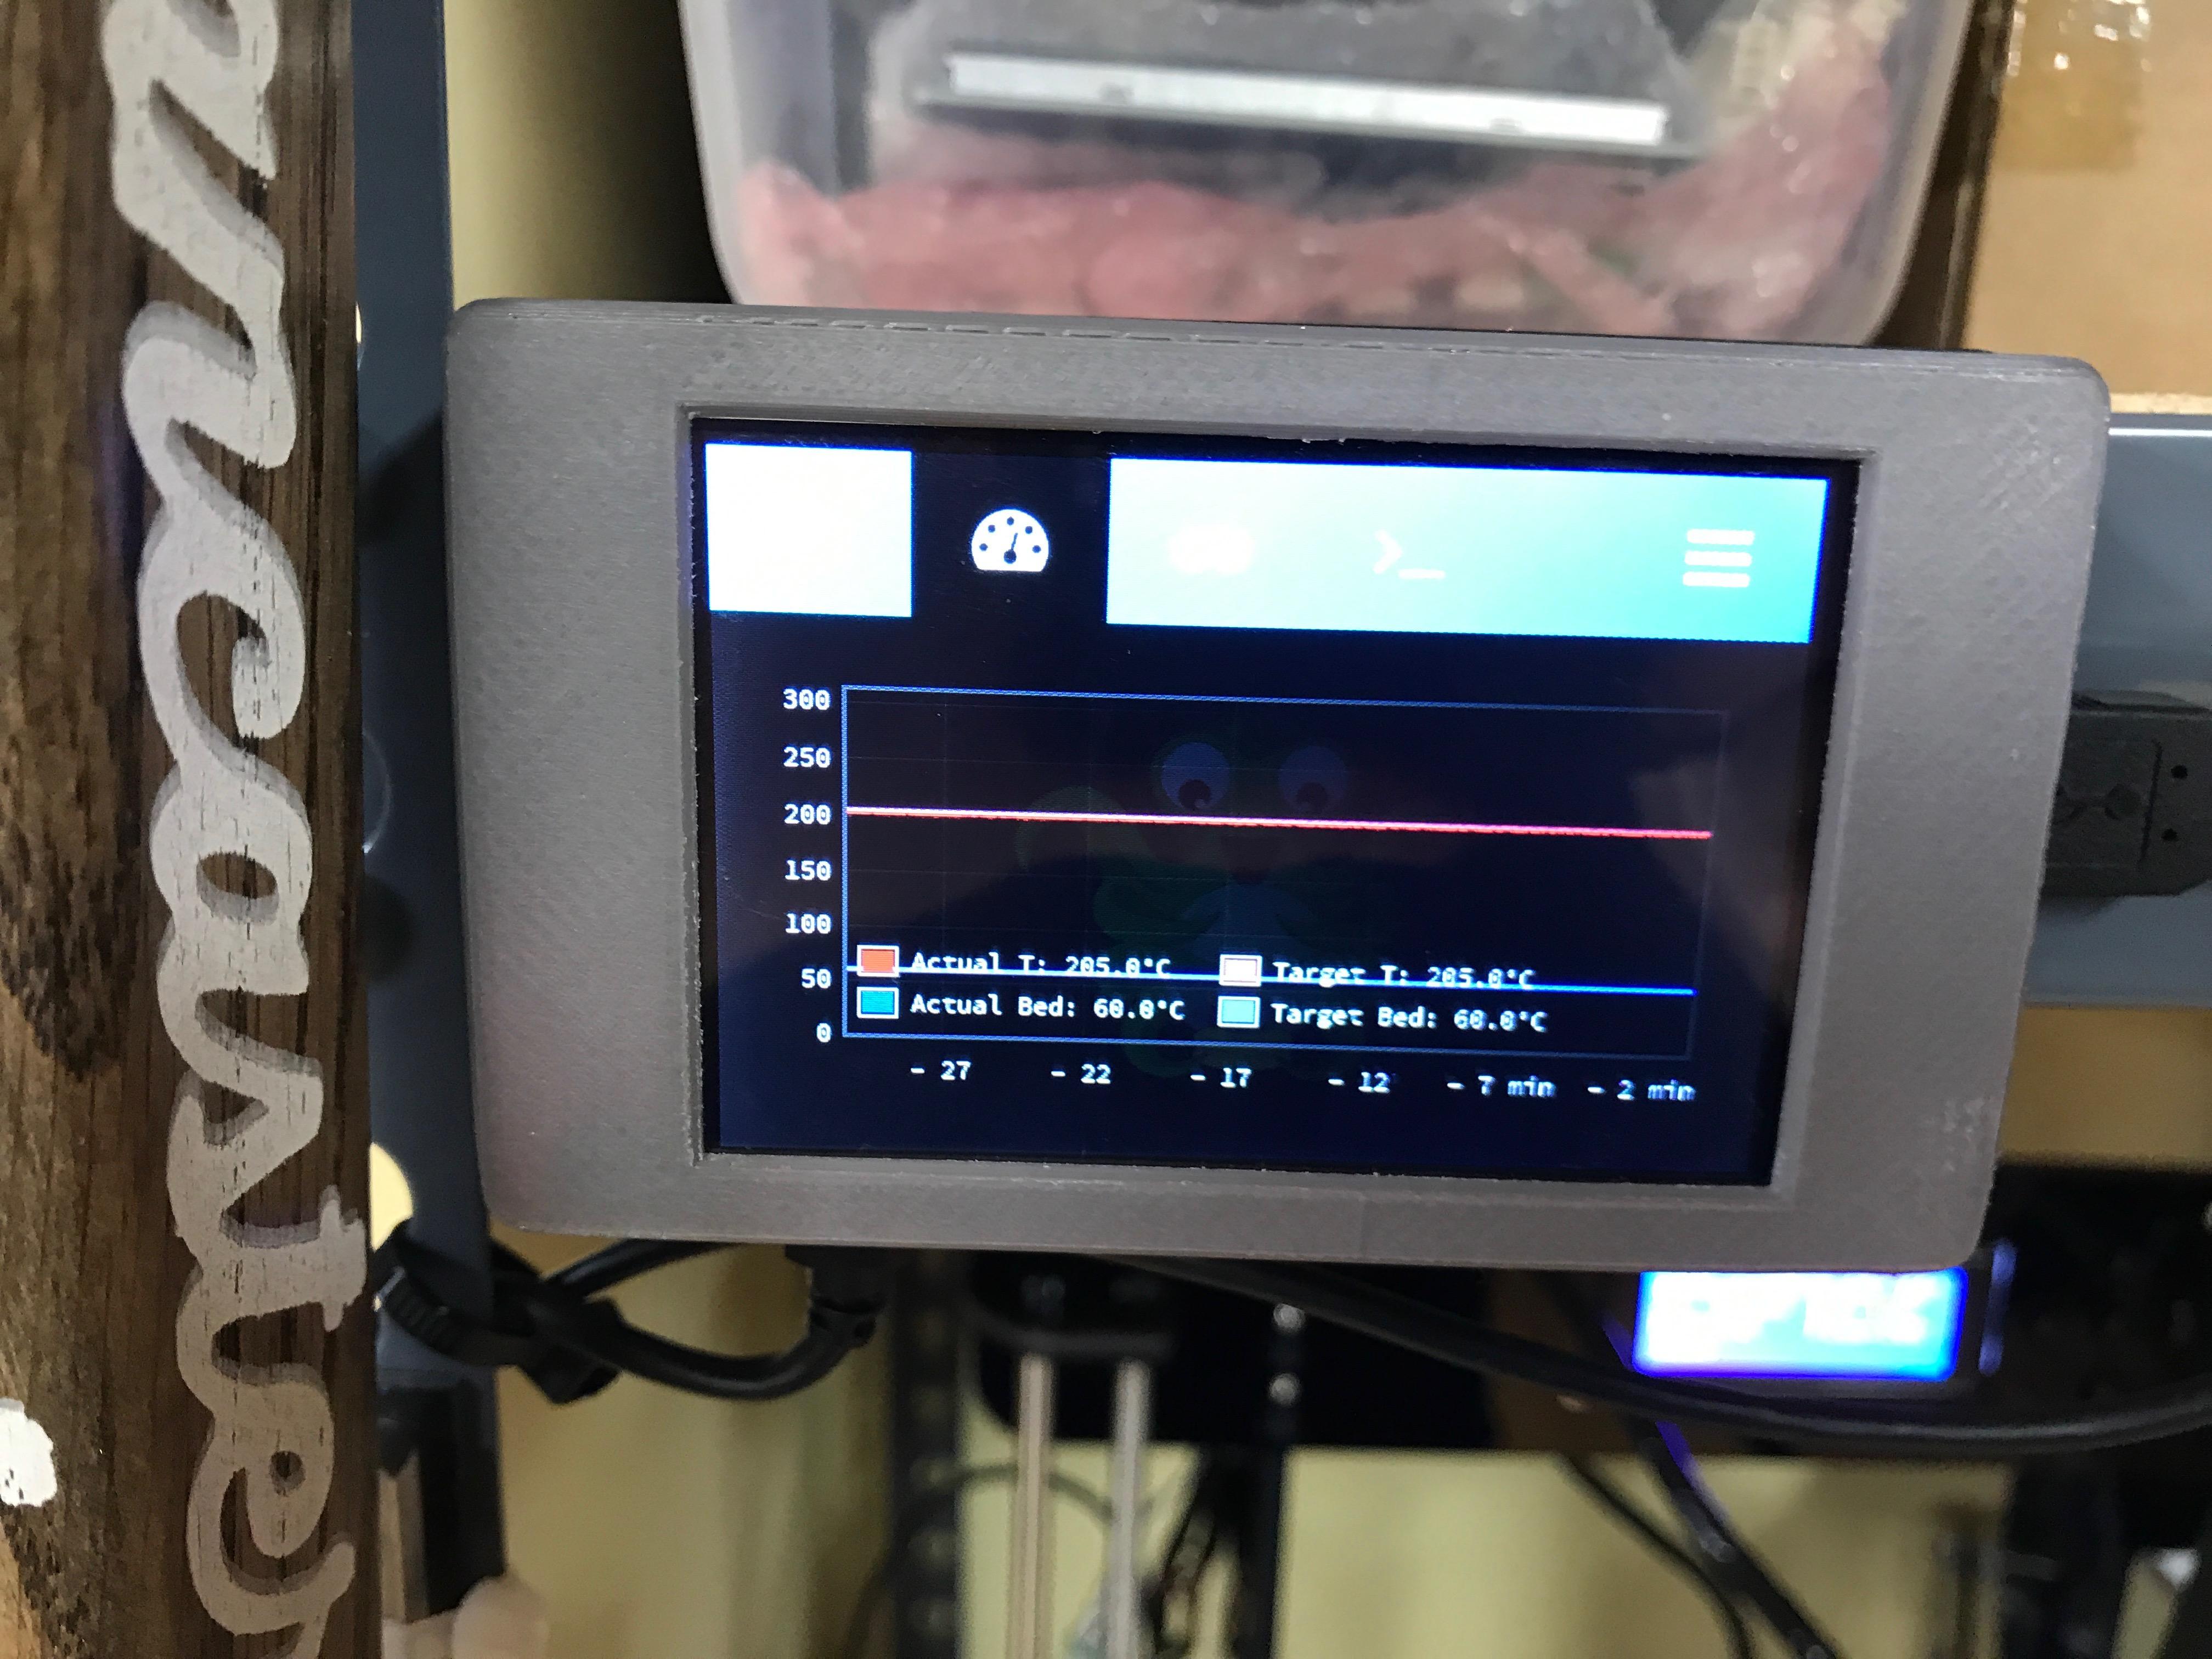 Raspberry Pi Touchscreen Octoprint Controller | Daniel Chote's